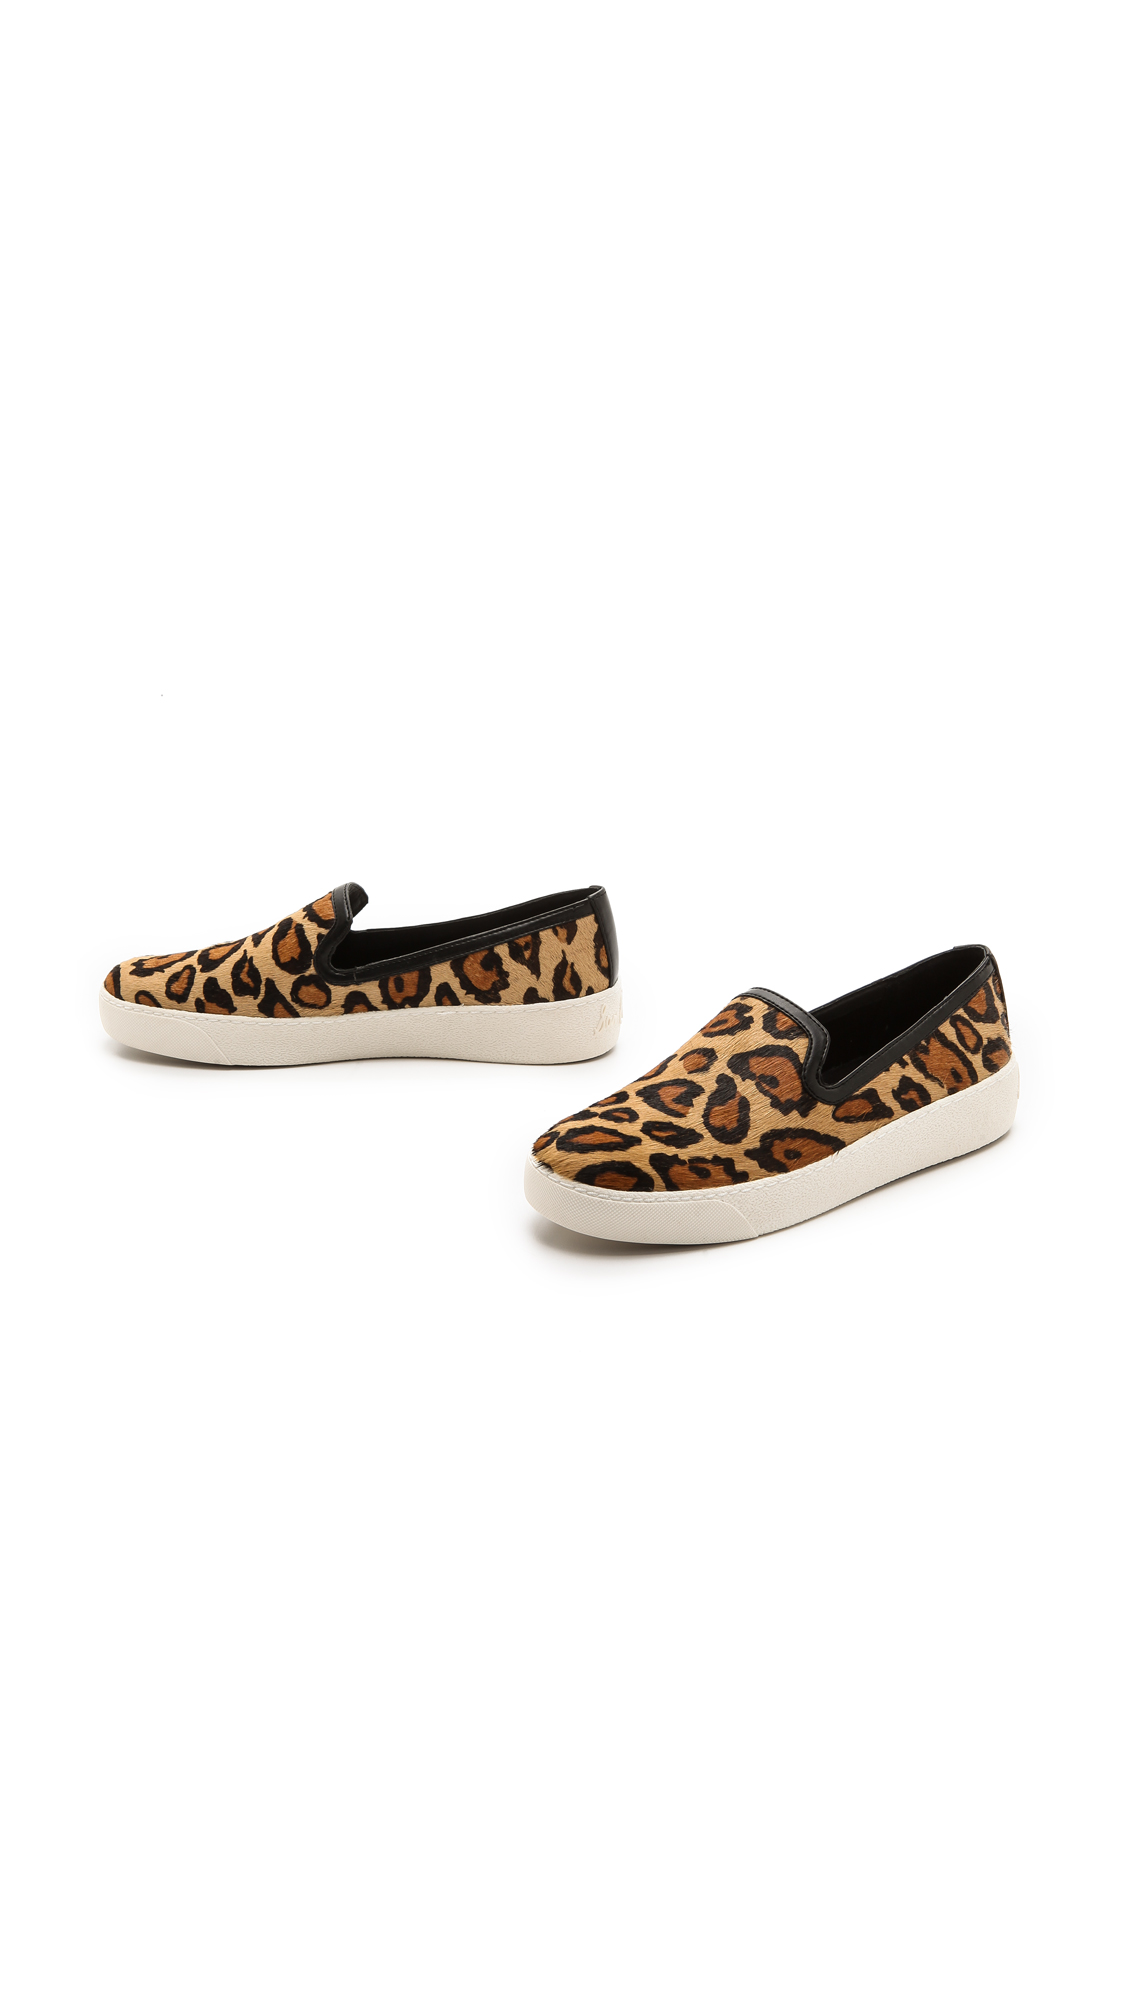 2eeca29a9aa436 Sam Edelman Becker Slip On Sneakers